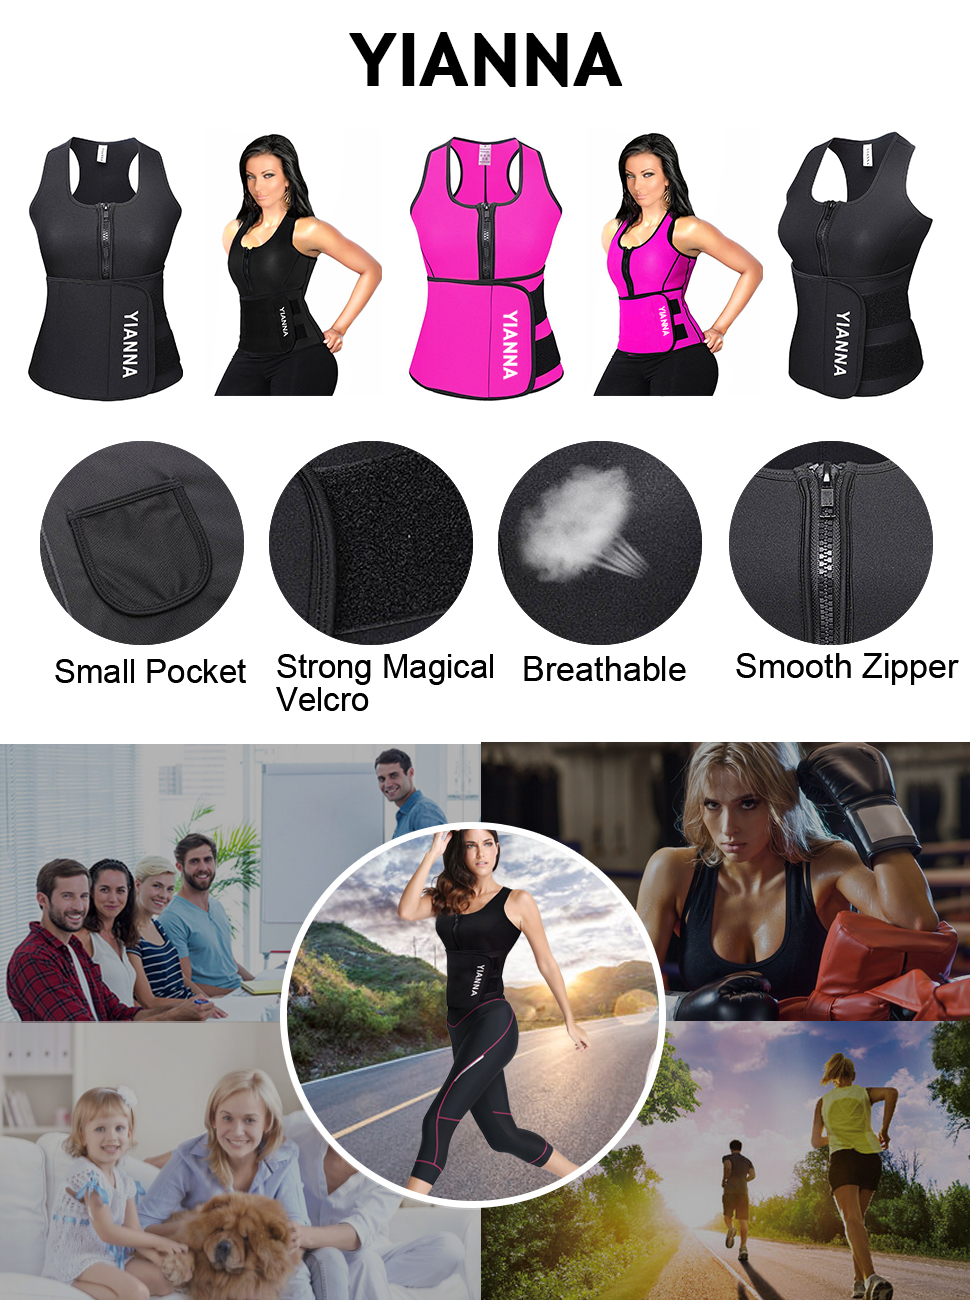 c8bc278445e YIANNA Women s Waist Trainer Trimmer Vest - Sauna Tank Top Vest with Adjustable  Shaper Trainer Belt - High Quality Neoprene - Enhance Workout During Cardio  ...